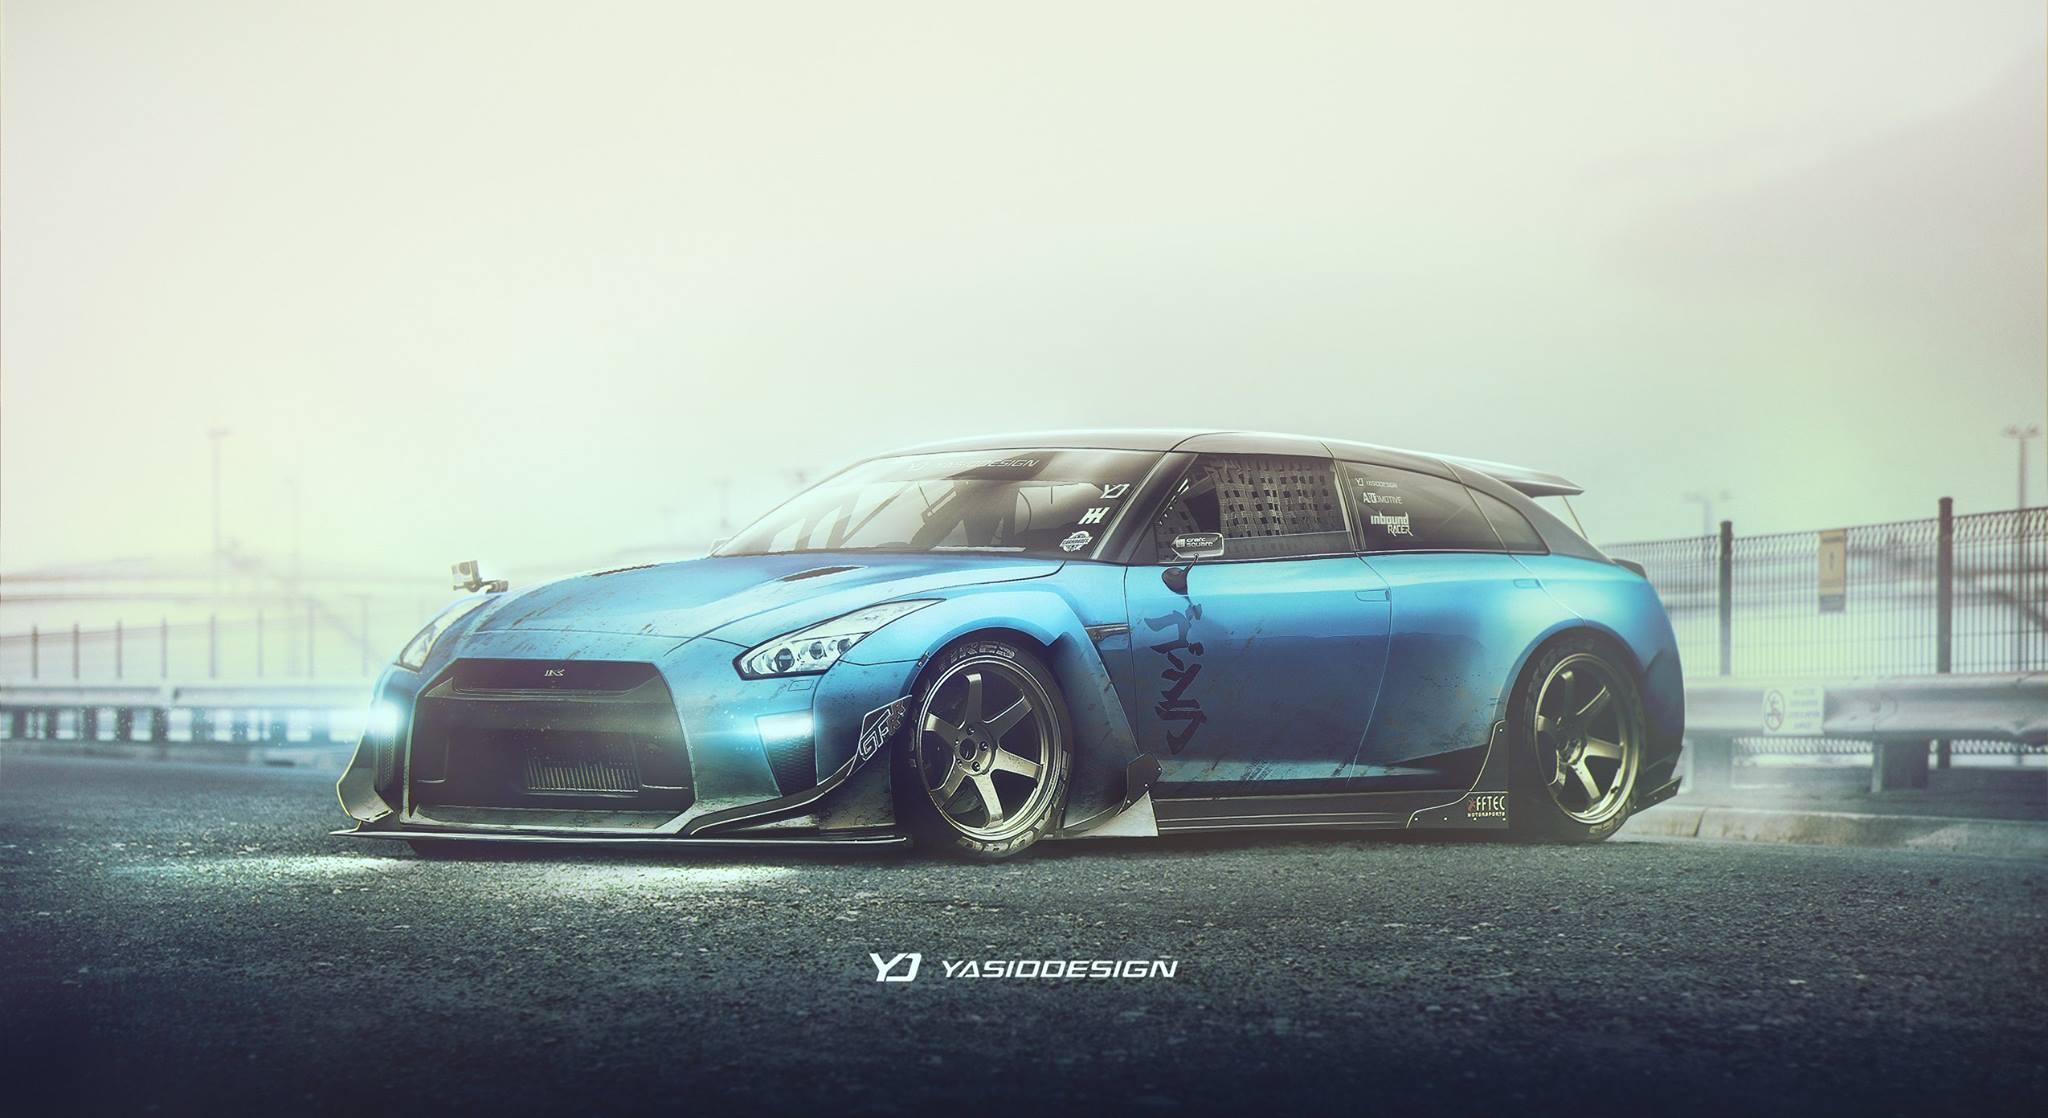 Yasid Design's Vision of a Nissan R35 GT-R Wagon